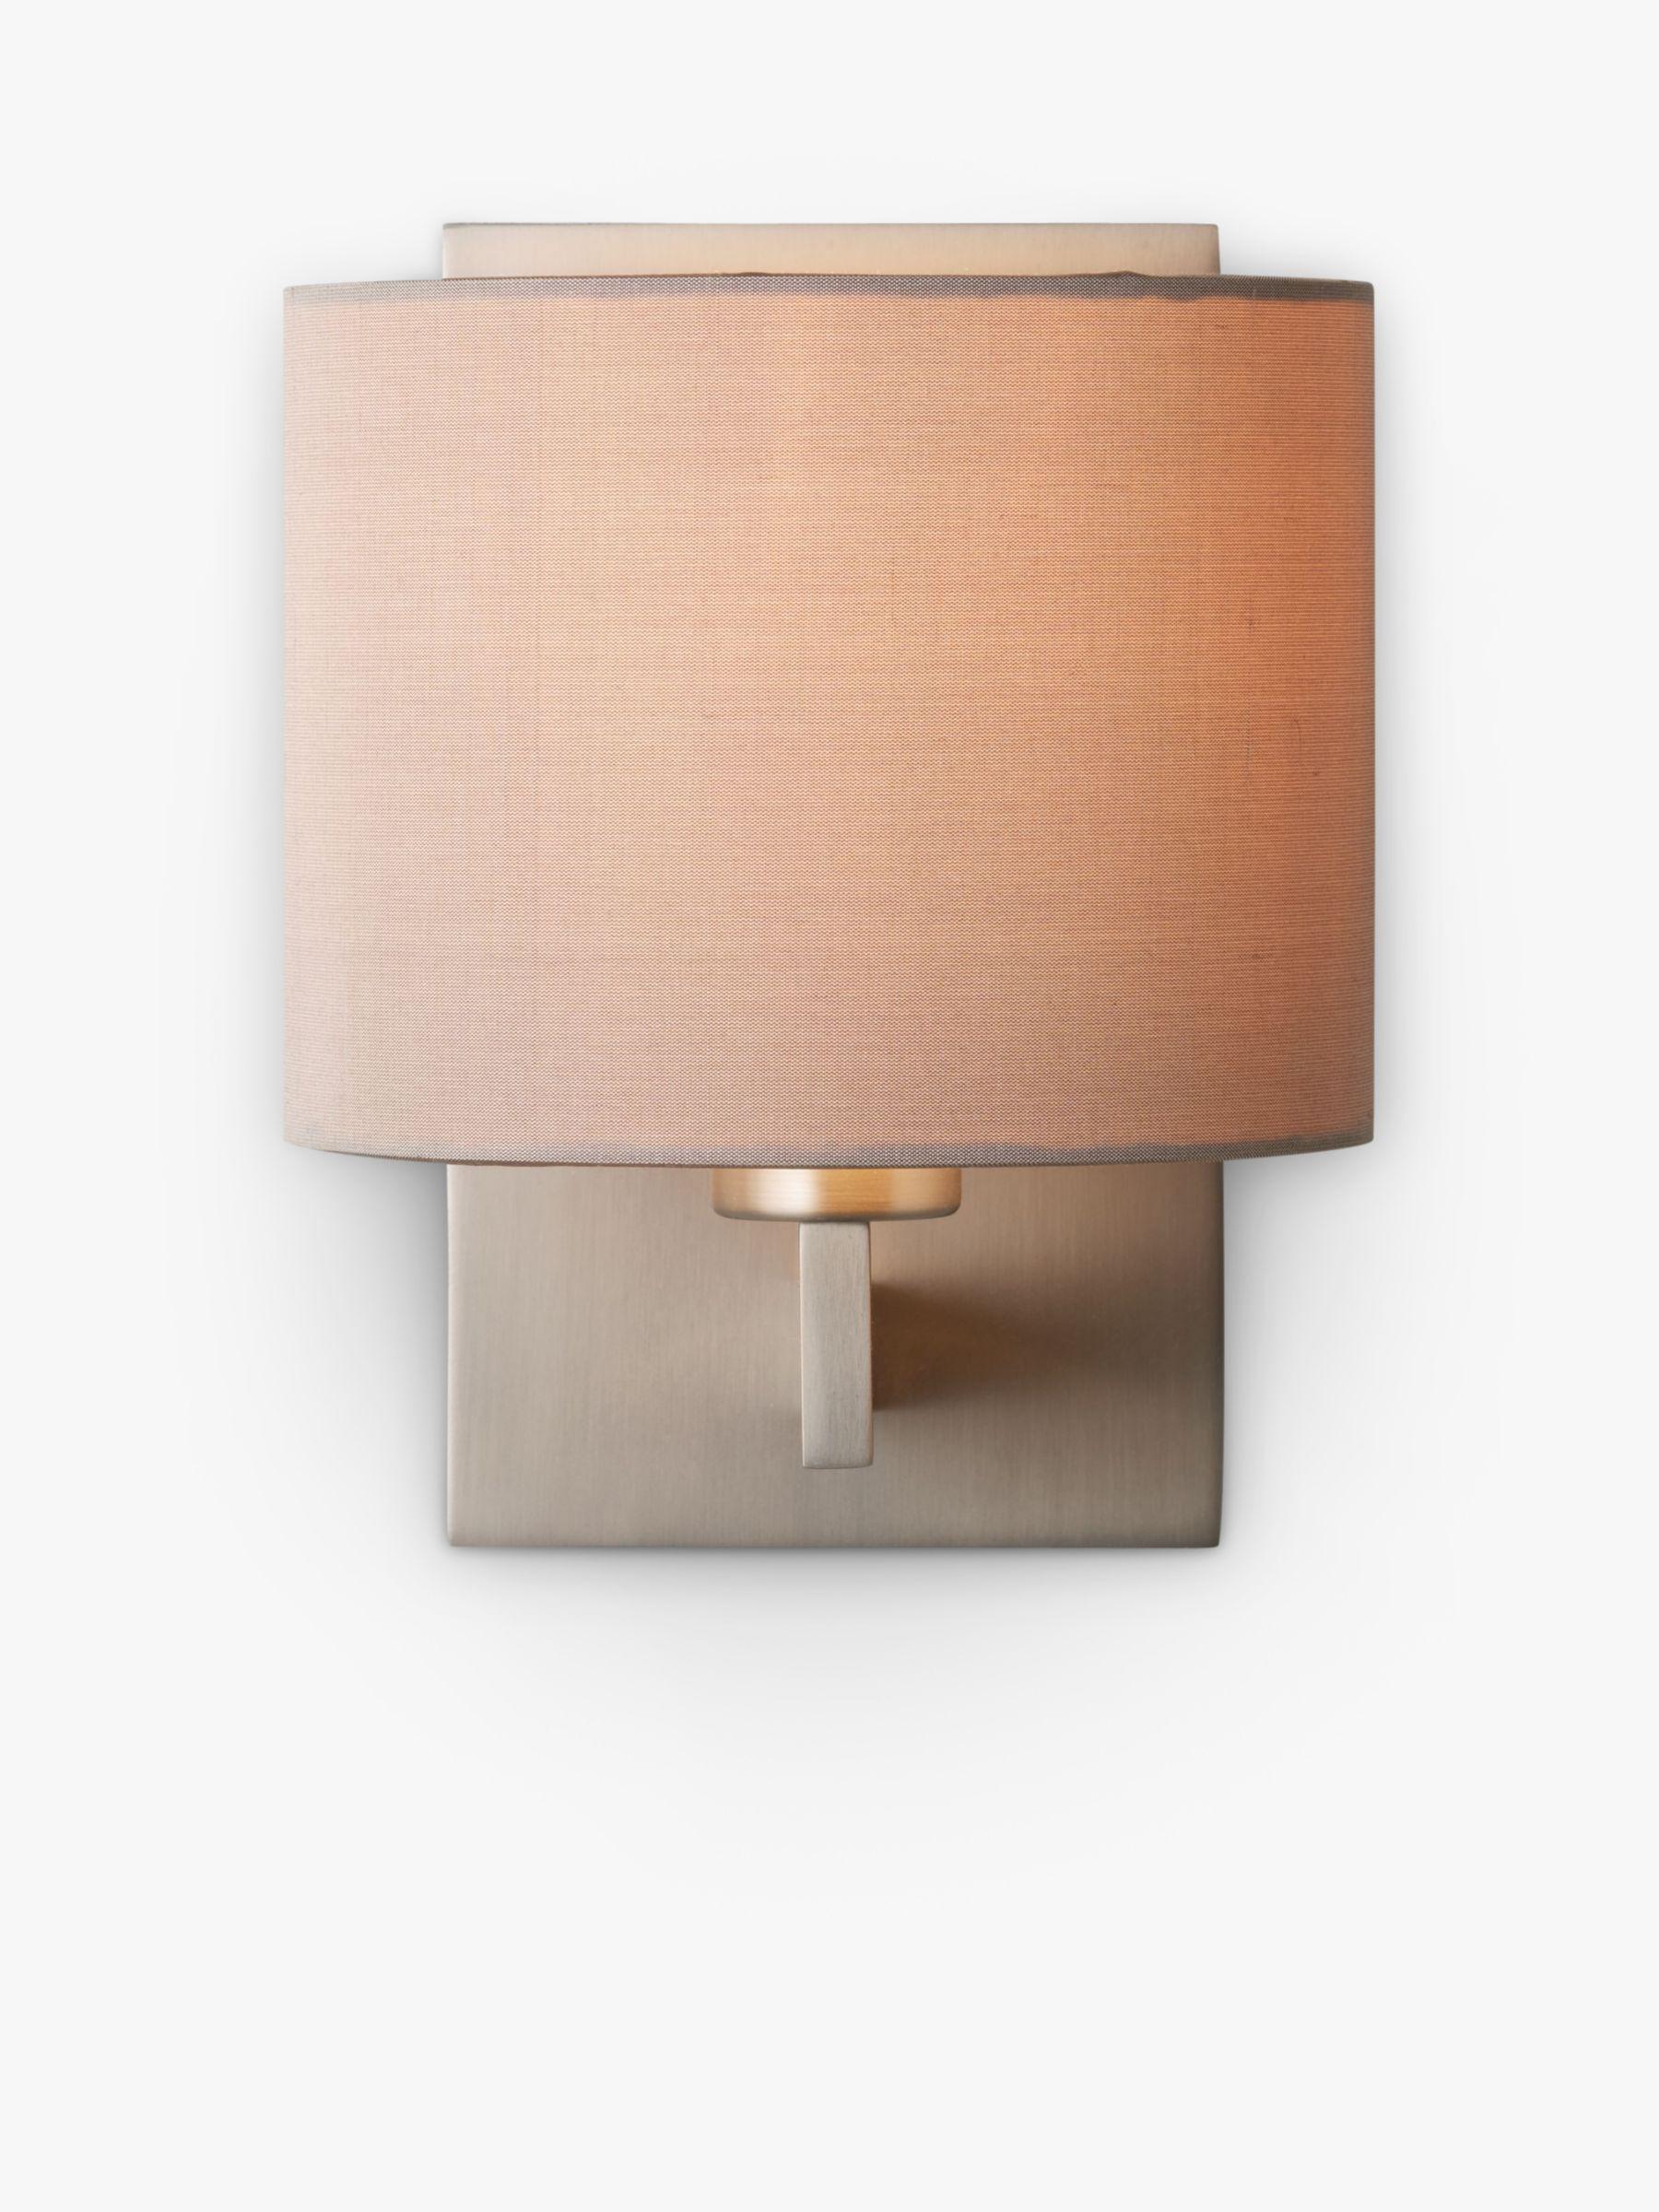 ASTRO Astro Olan Wall Light with Silk Shade, Nickel/Oyster